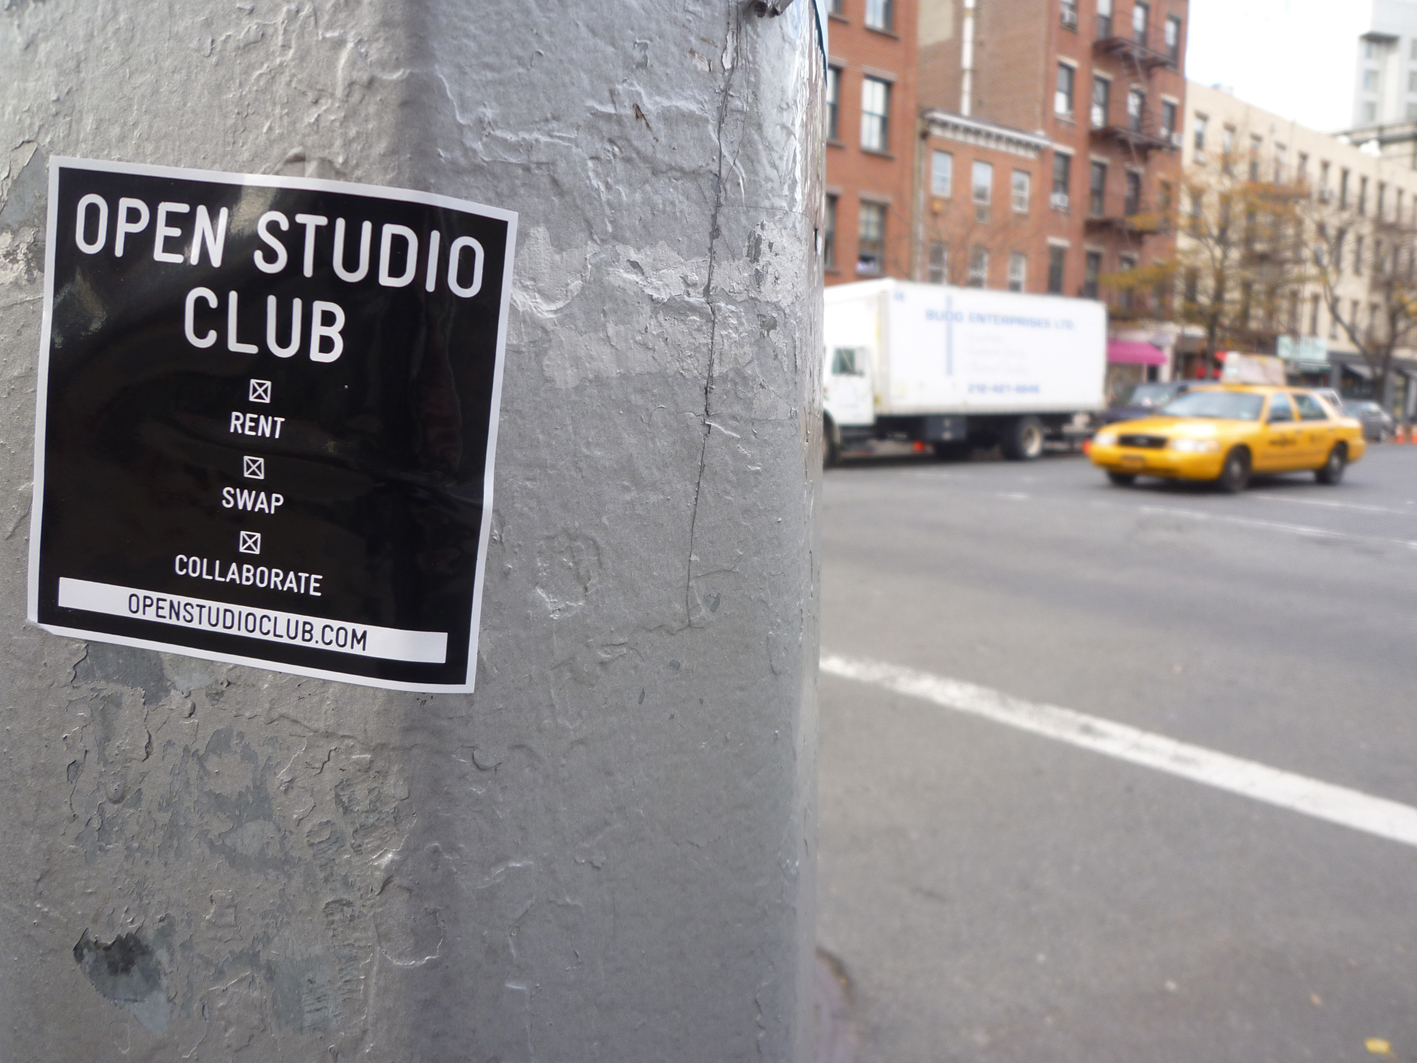 Open Studio Club